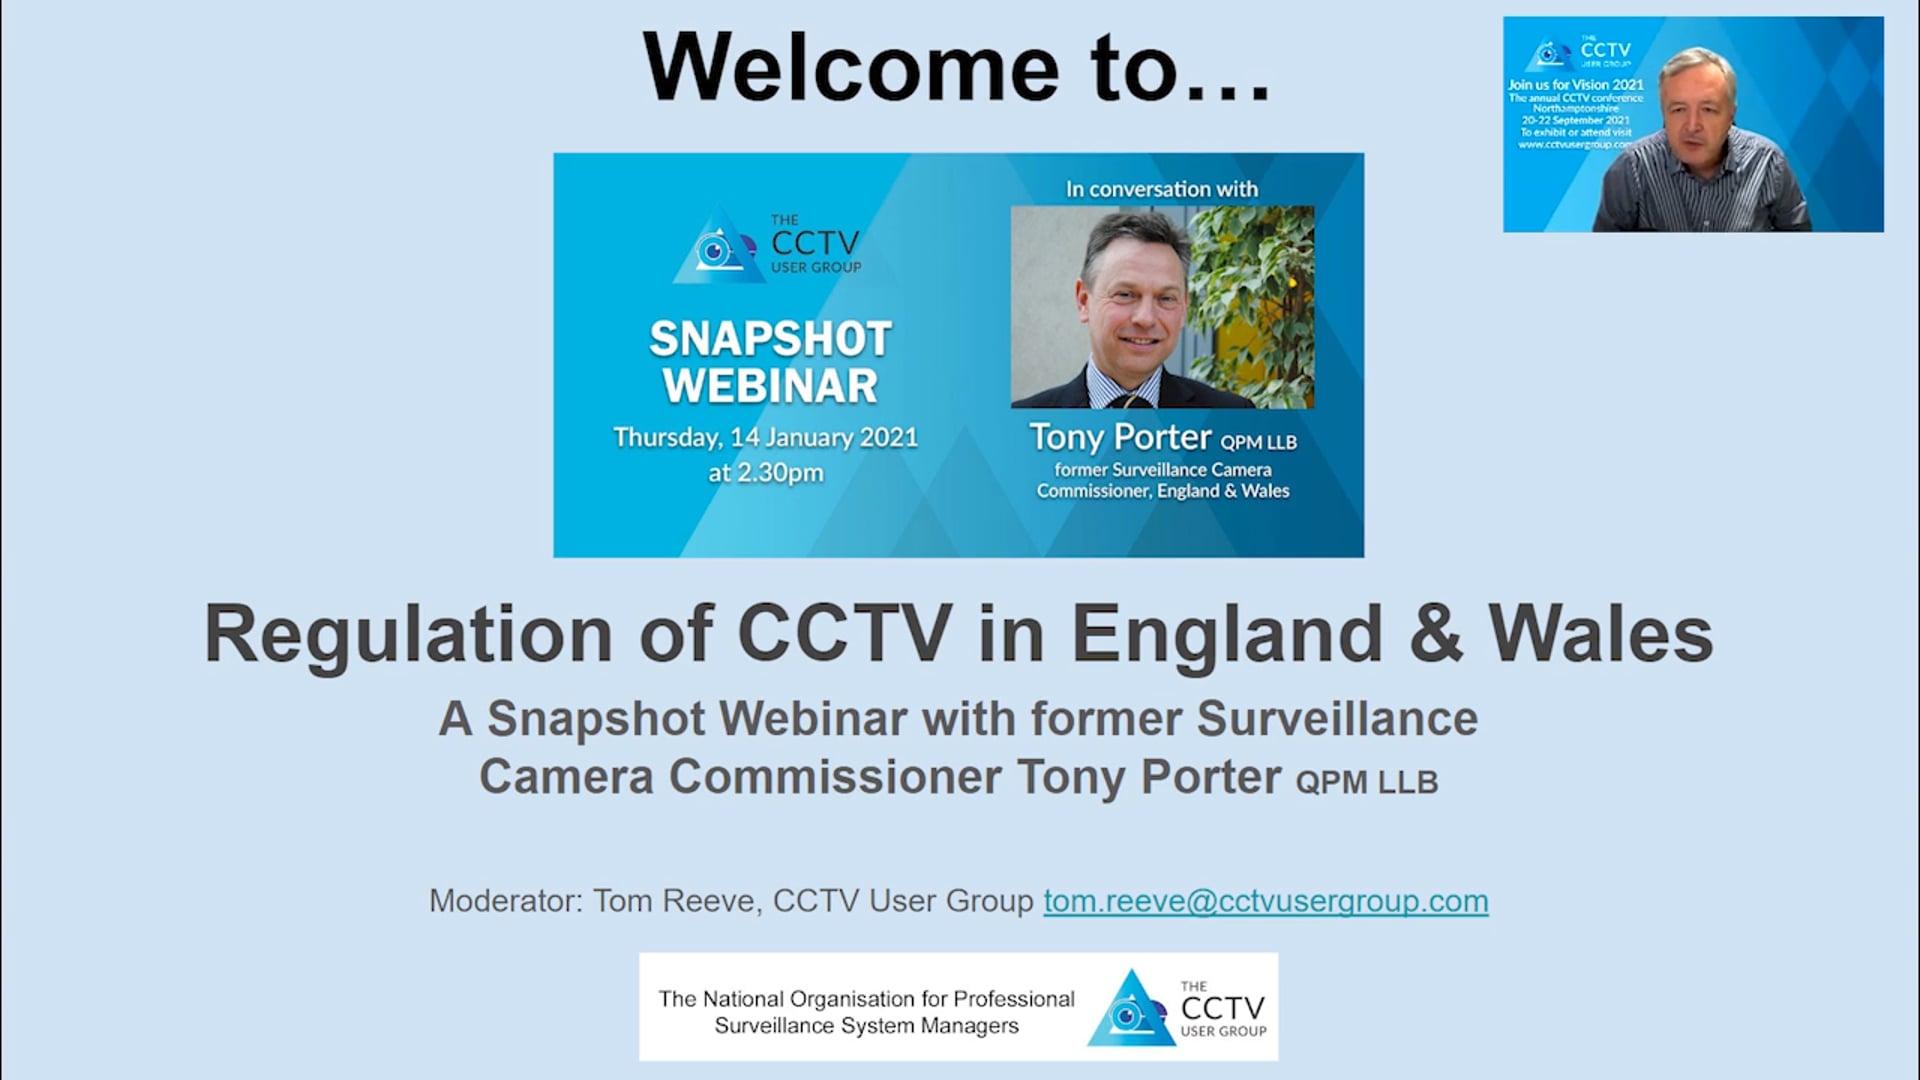 04 Snapshot Webinar - In conversation with Tony Porter